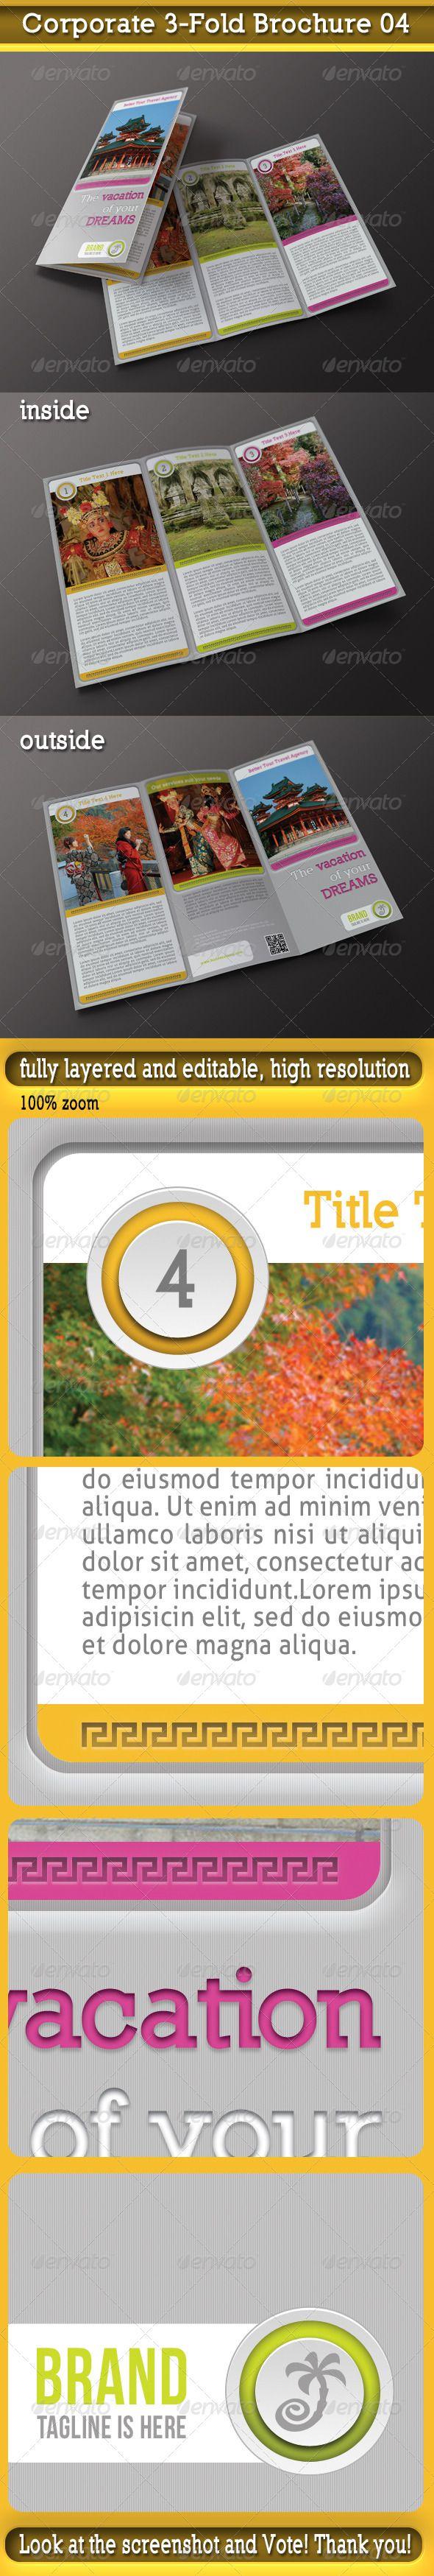 93 best print templates images on pinterest print templates font